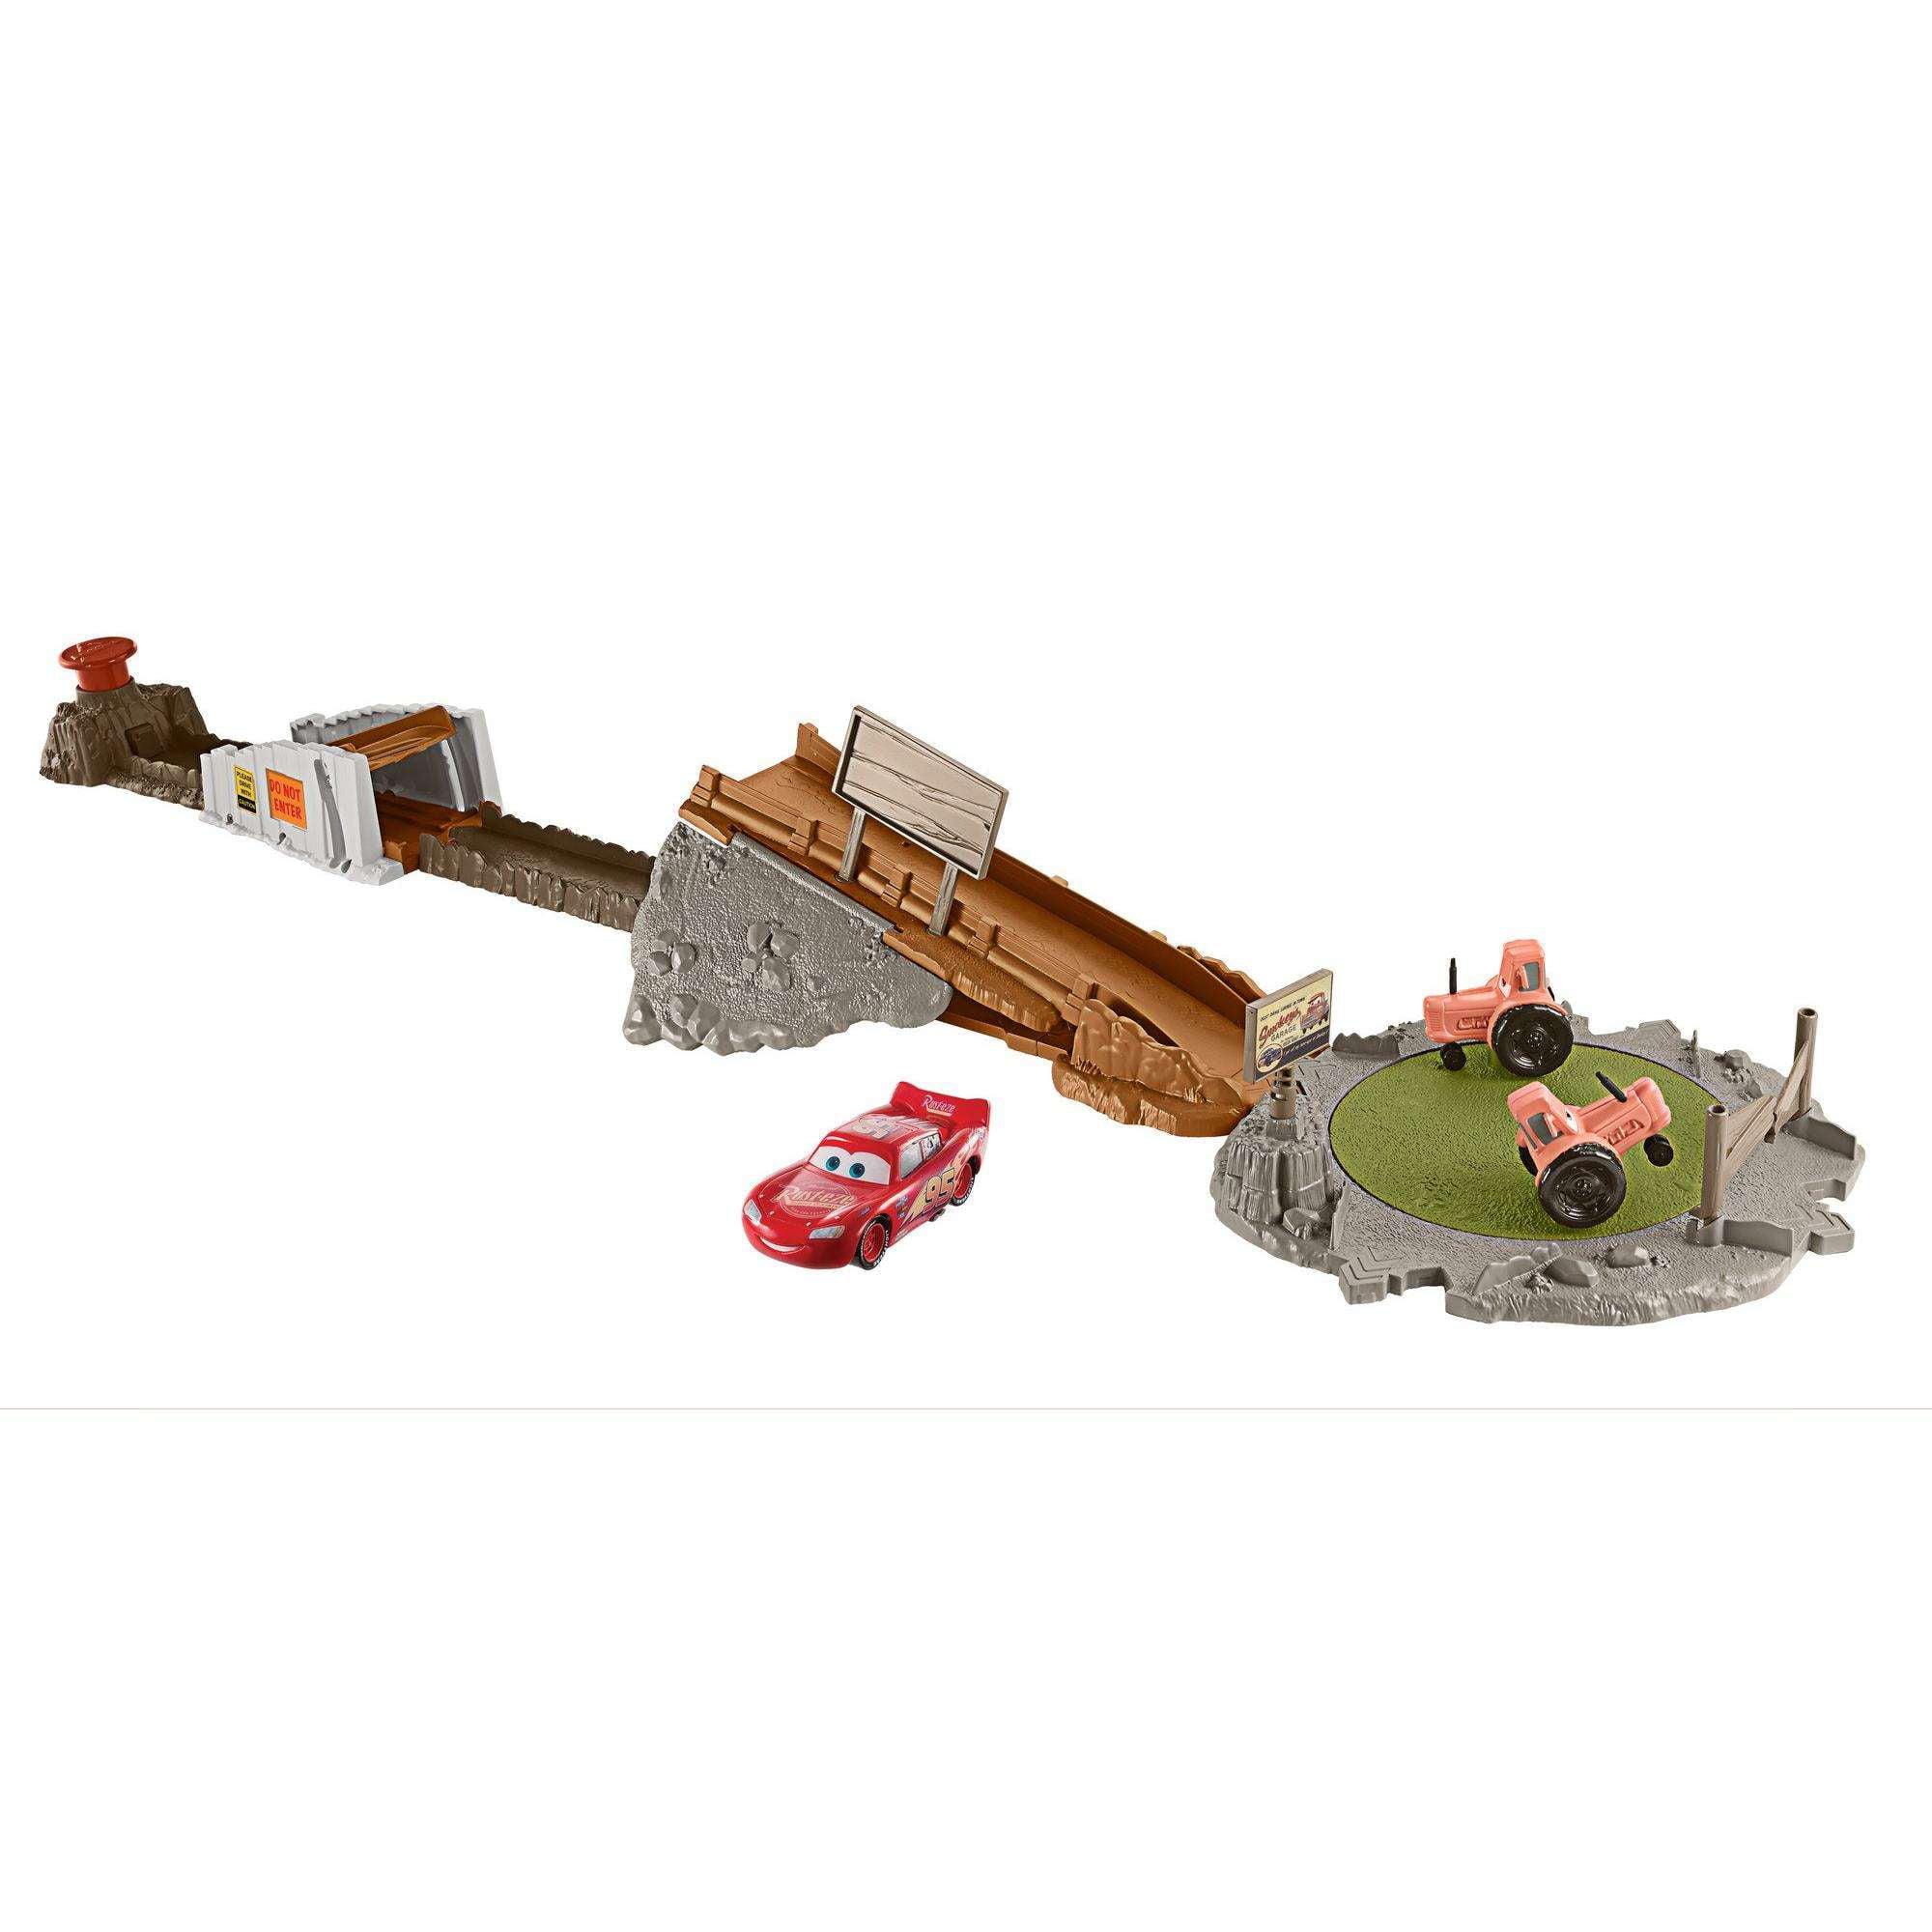 Disney Pixar Cars Smokey's Tractor Challenge Playset by Mattel